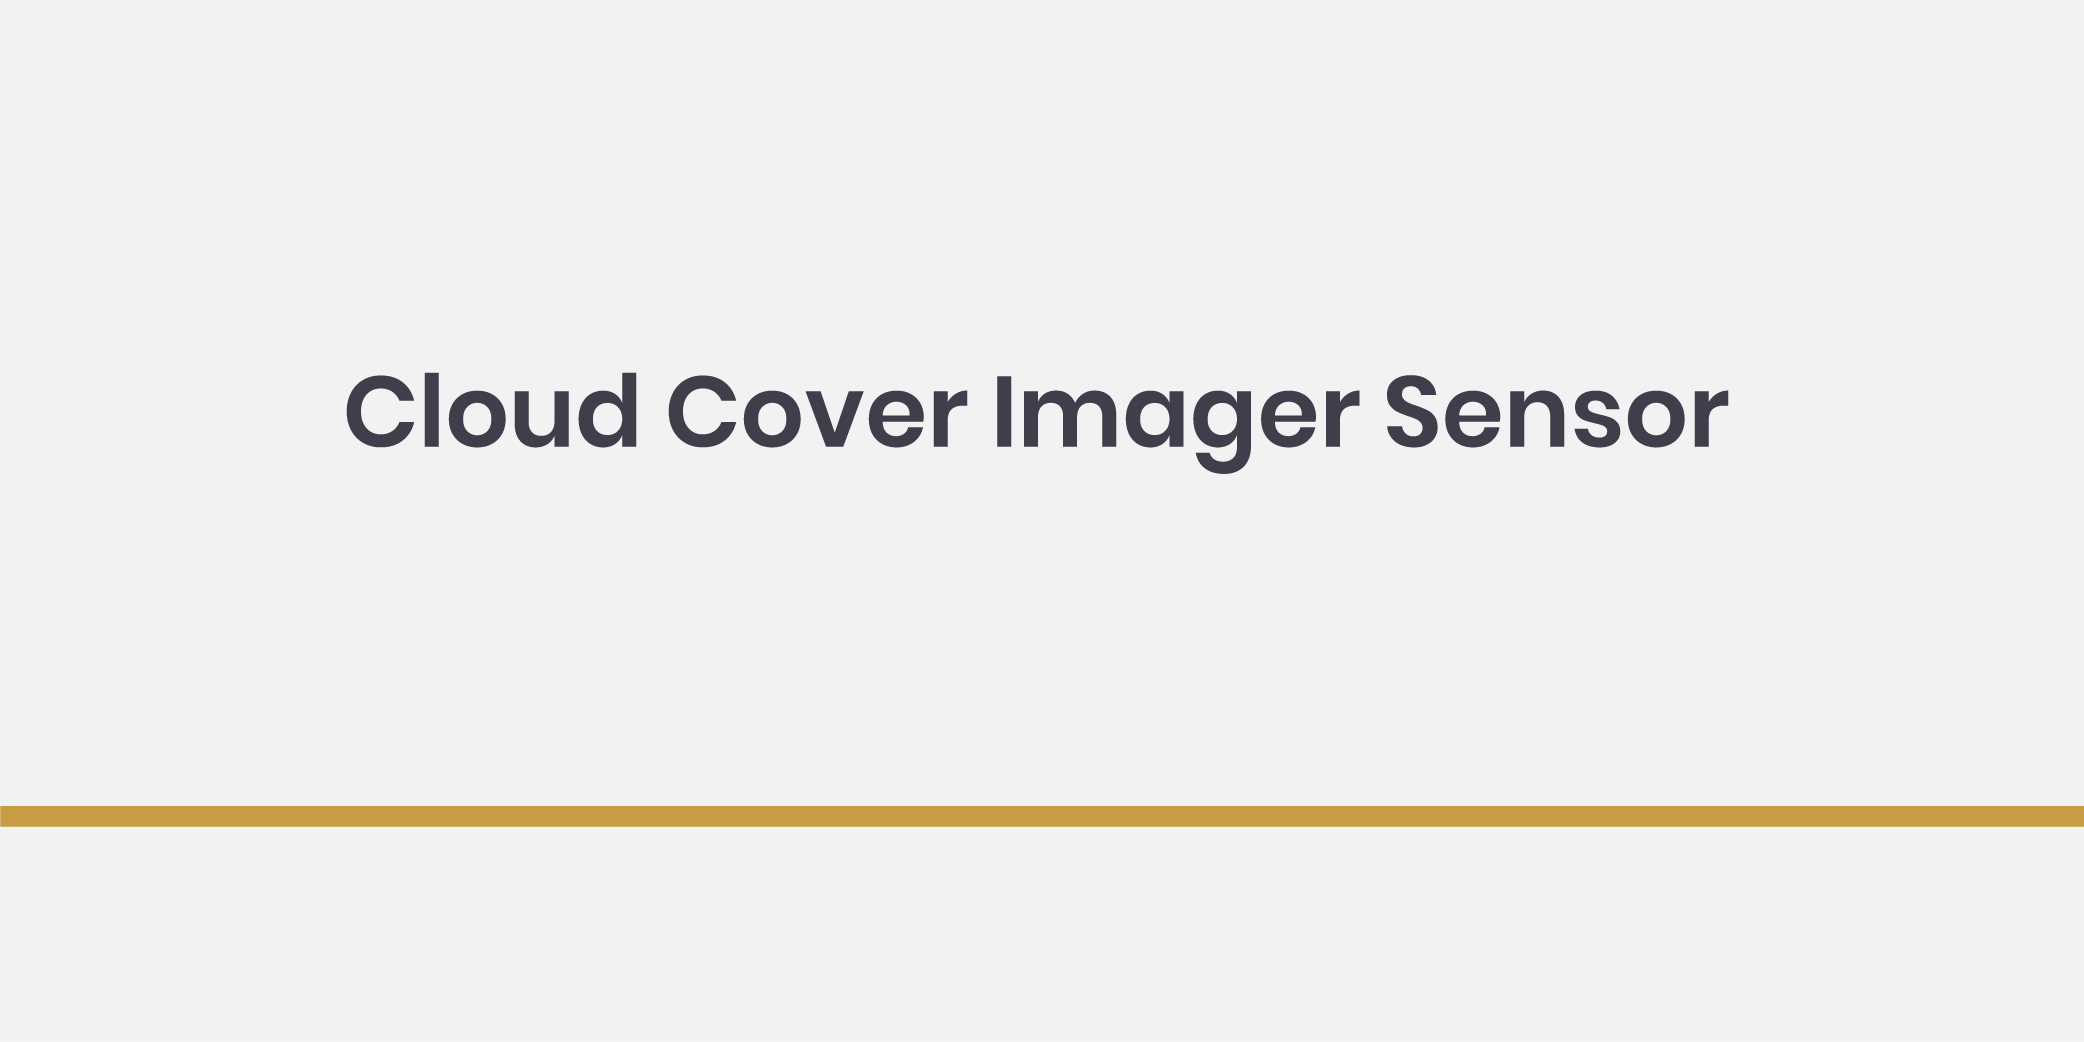 Cloud Cover Imager Sensor